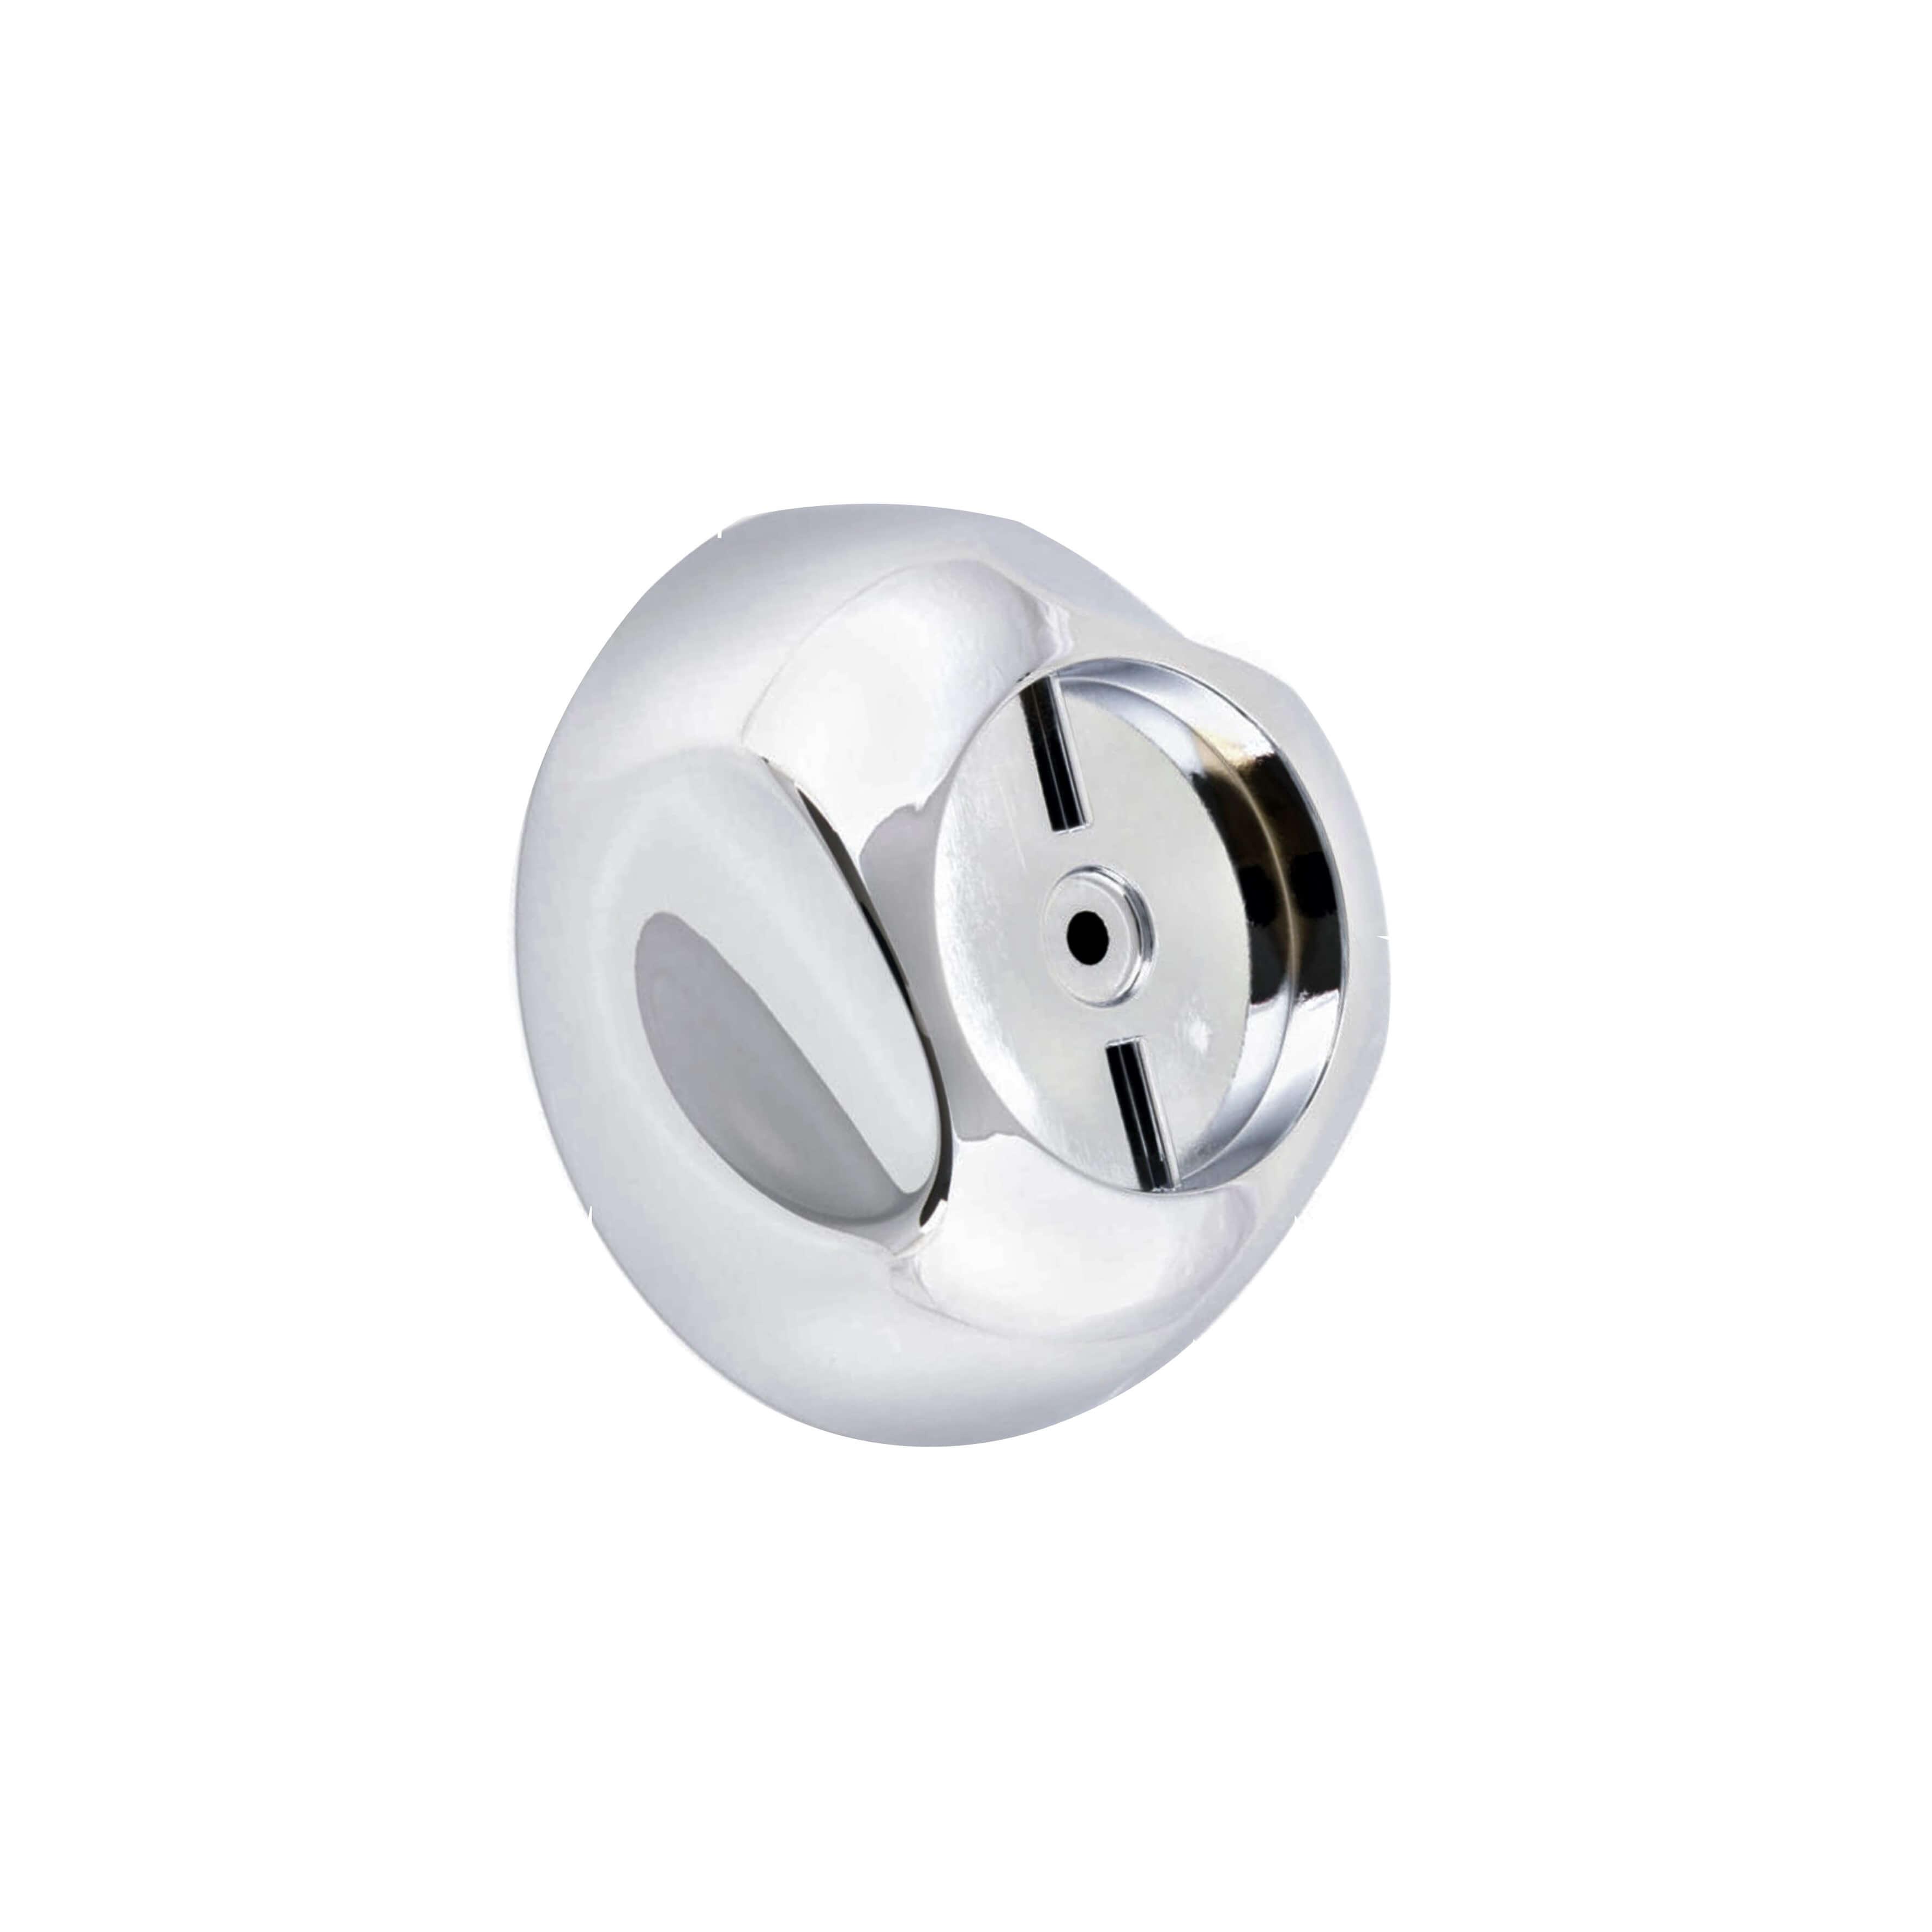 Aqualisa Control Knob Chrome 213002